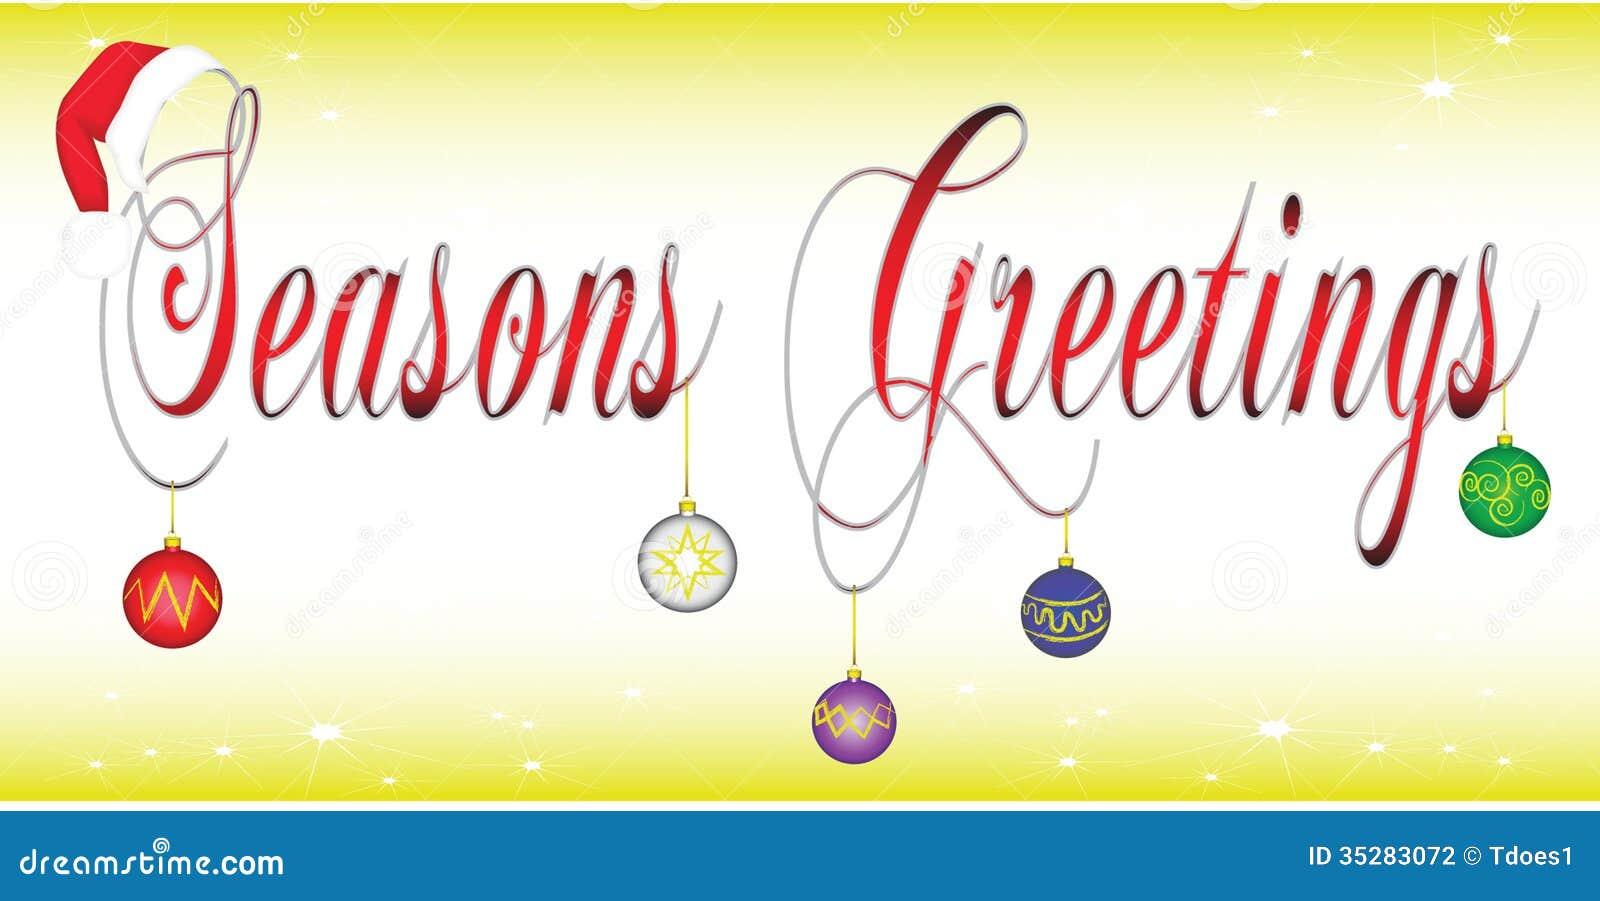 Seasons greetings banner stock vector illustration of purple 35283072 seasons greetings banner kristyandbryce Images